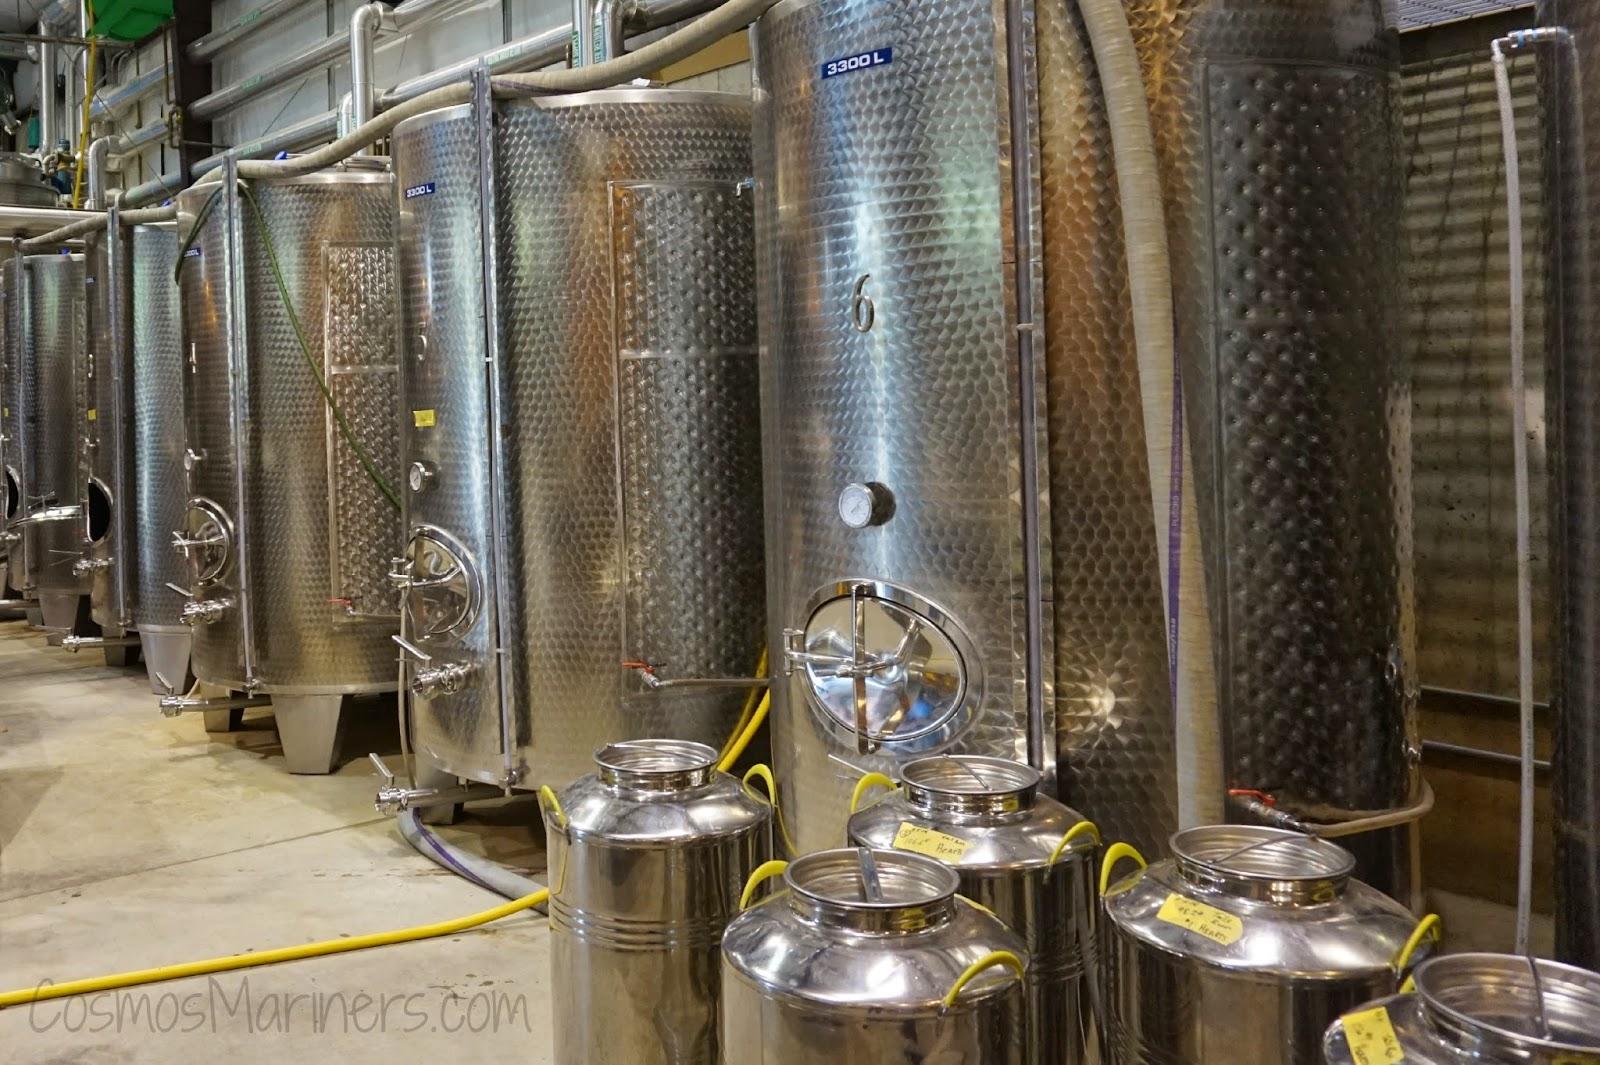 Defiant Whiskey, Blue Ridge Distillery, Golden Valley, NC   CosmosMariners.com